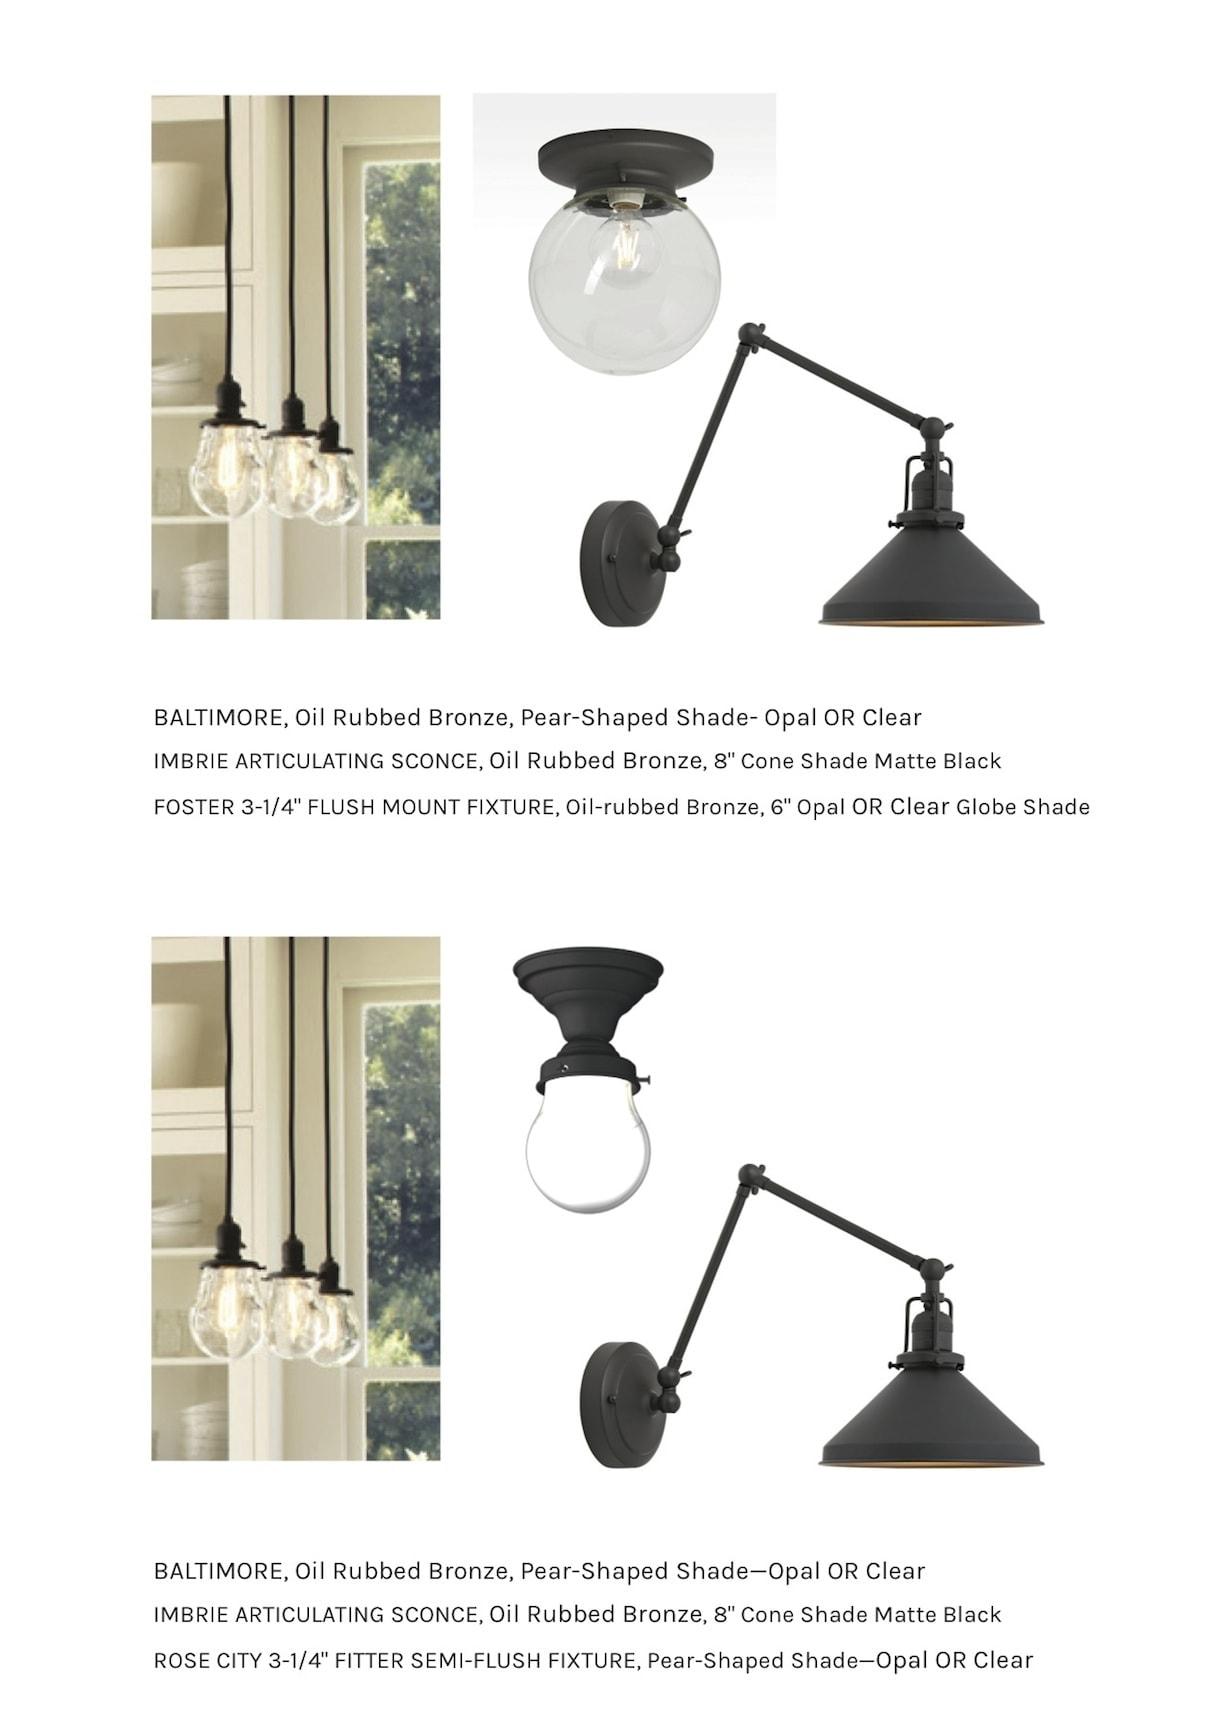 rejuvenation lighting, kitchen renovation